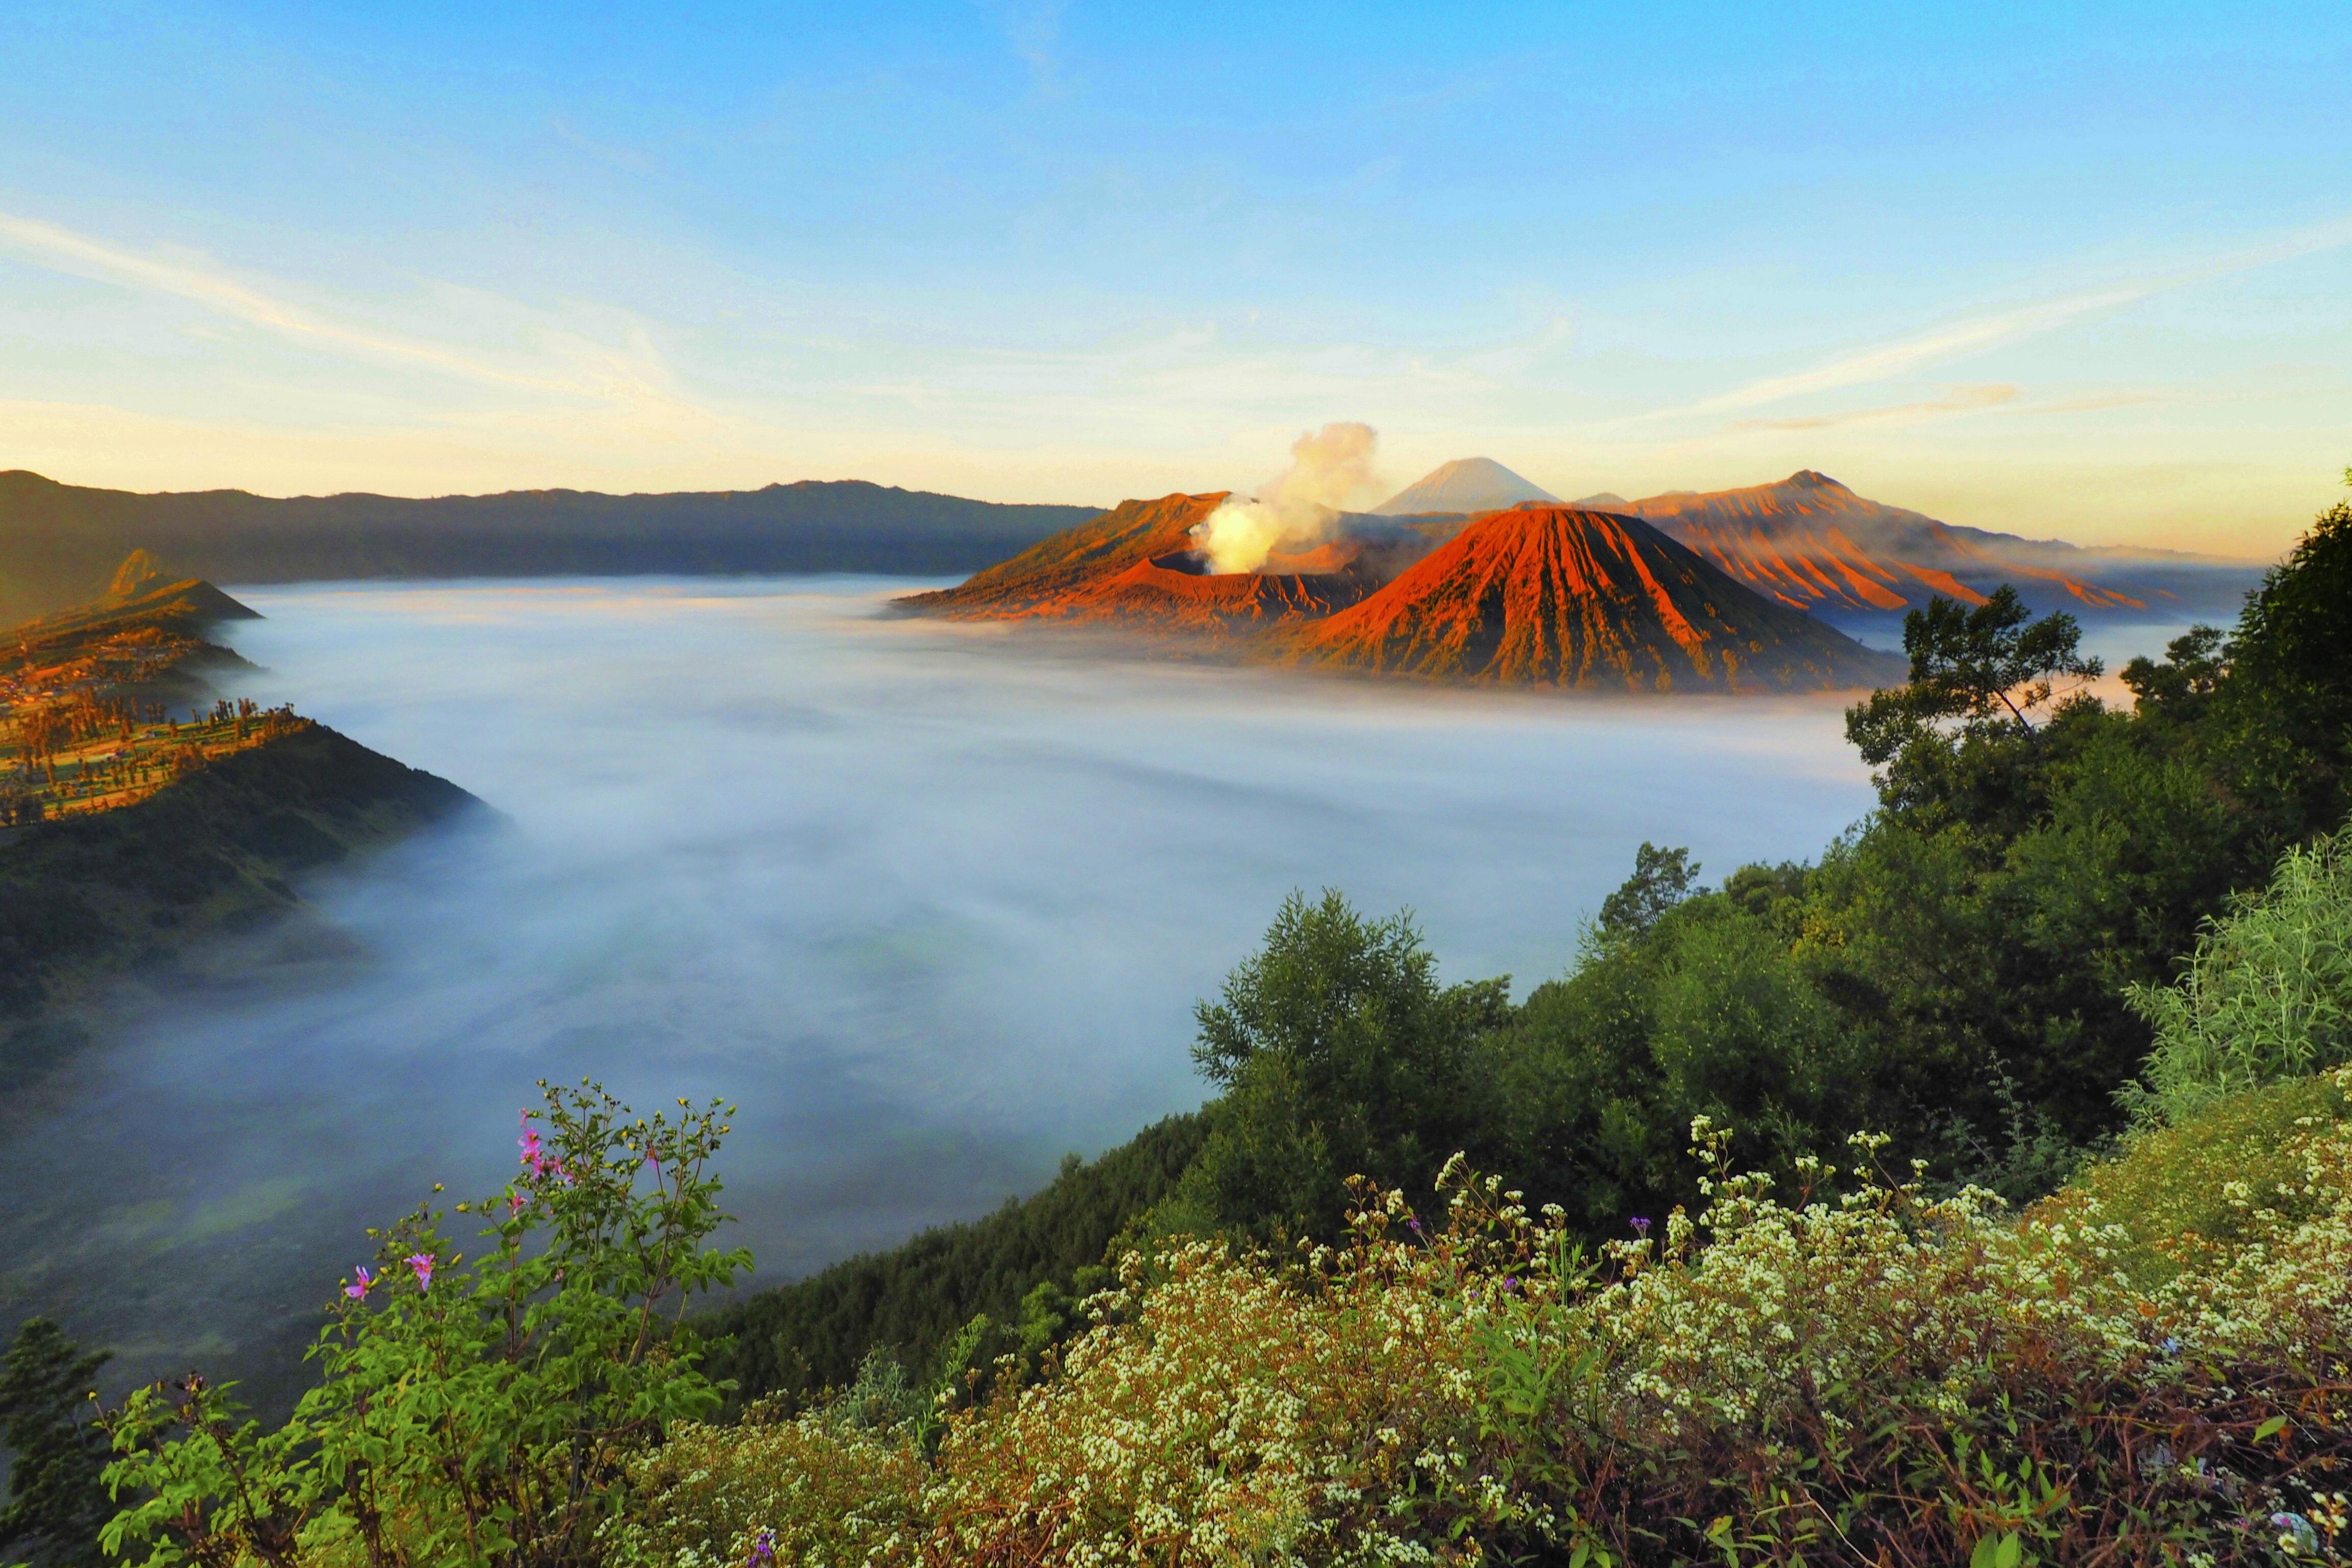 Taman Nasional Bromo Tengger Semeru Wikipedia Bahasa Indonesia Ensiklopedia Bebas